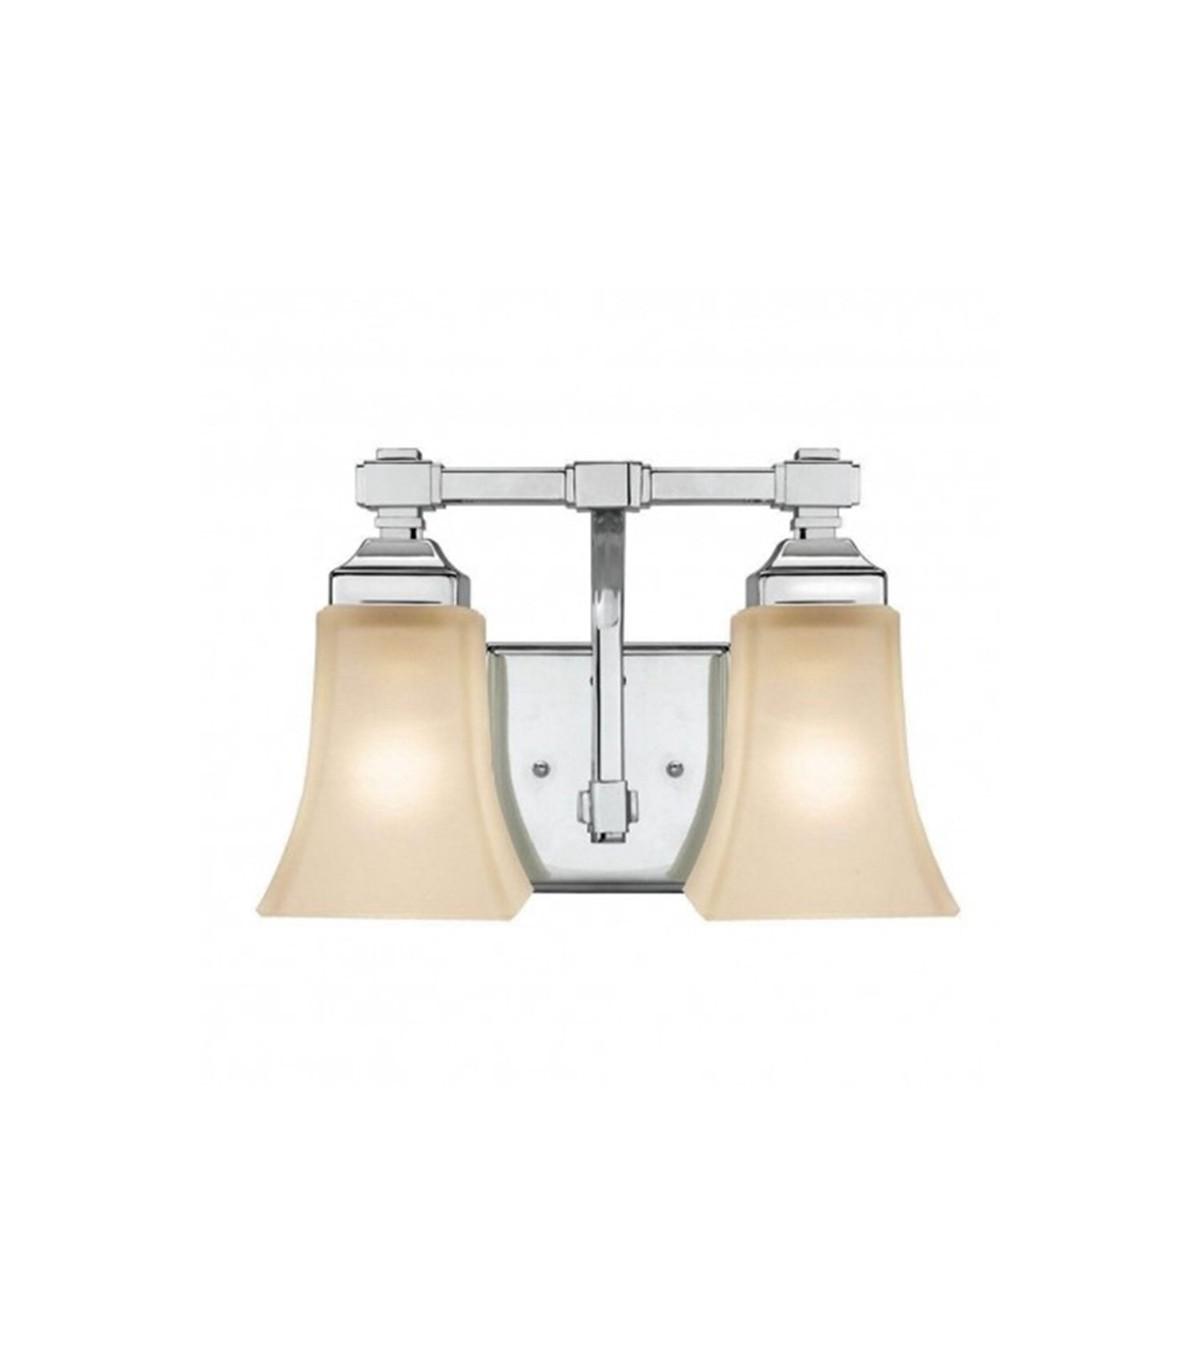 Hampton bay 2 light chrome vanity light fixture aloadofball Choice Image